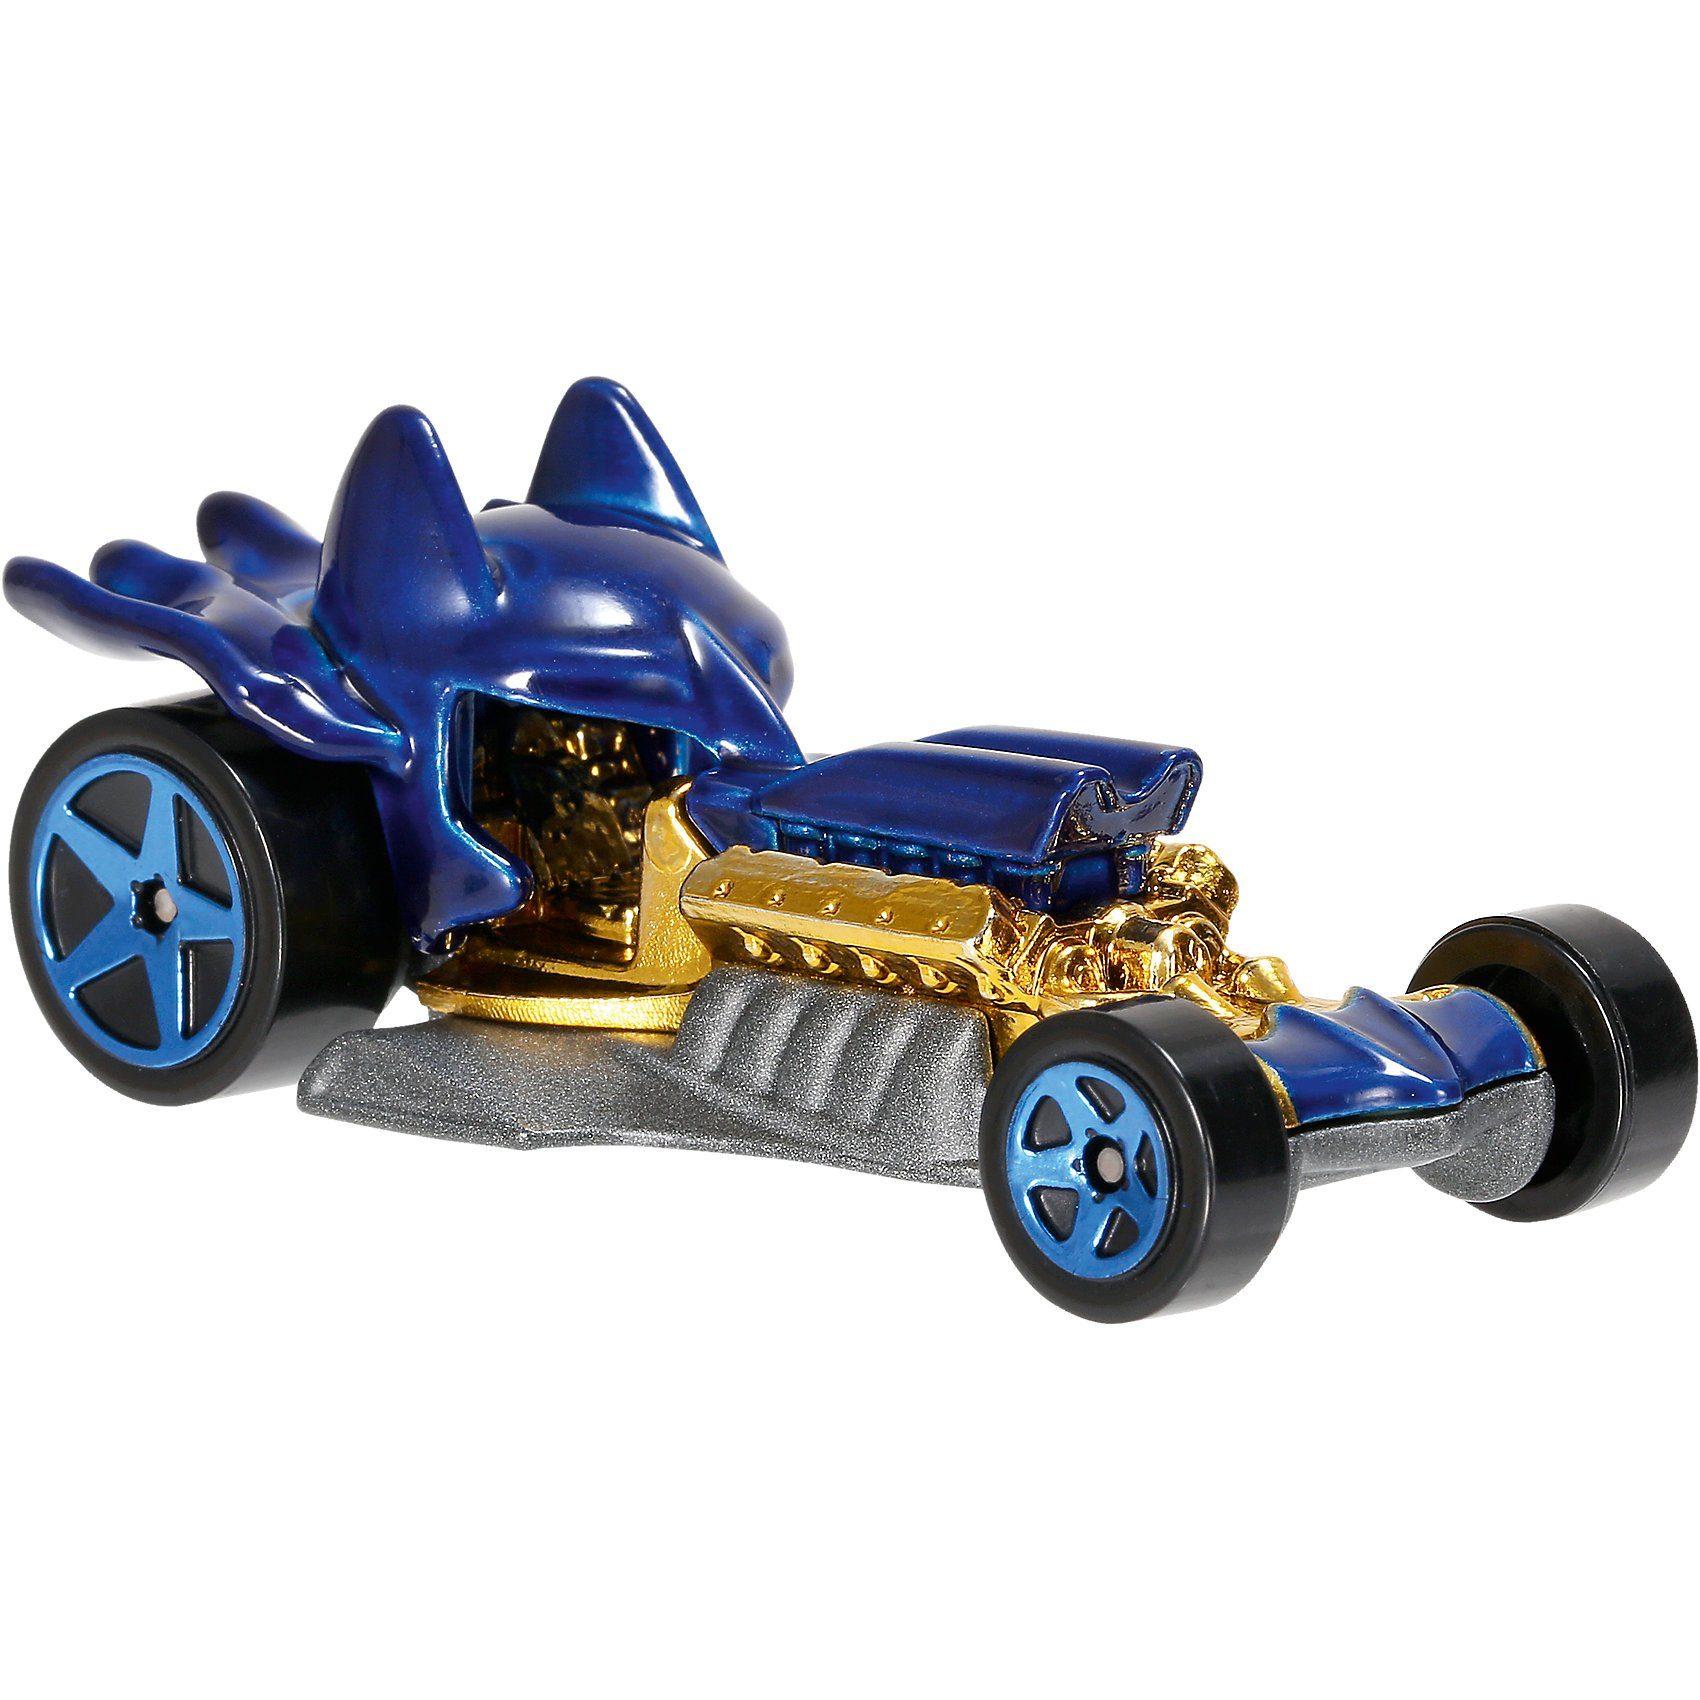 Mattel Hot Wheels DC Comics 1:64 Character Car Sortiment (rolliere